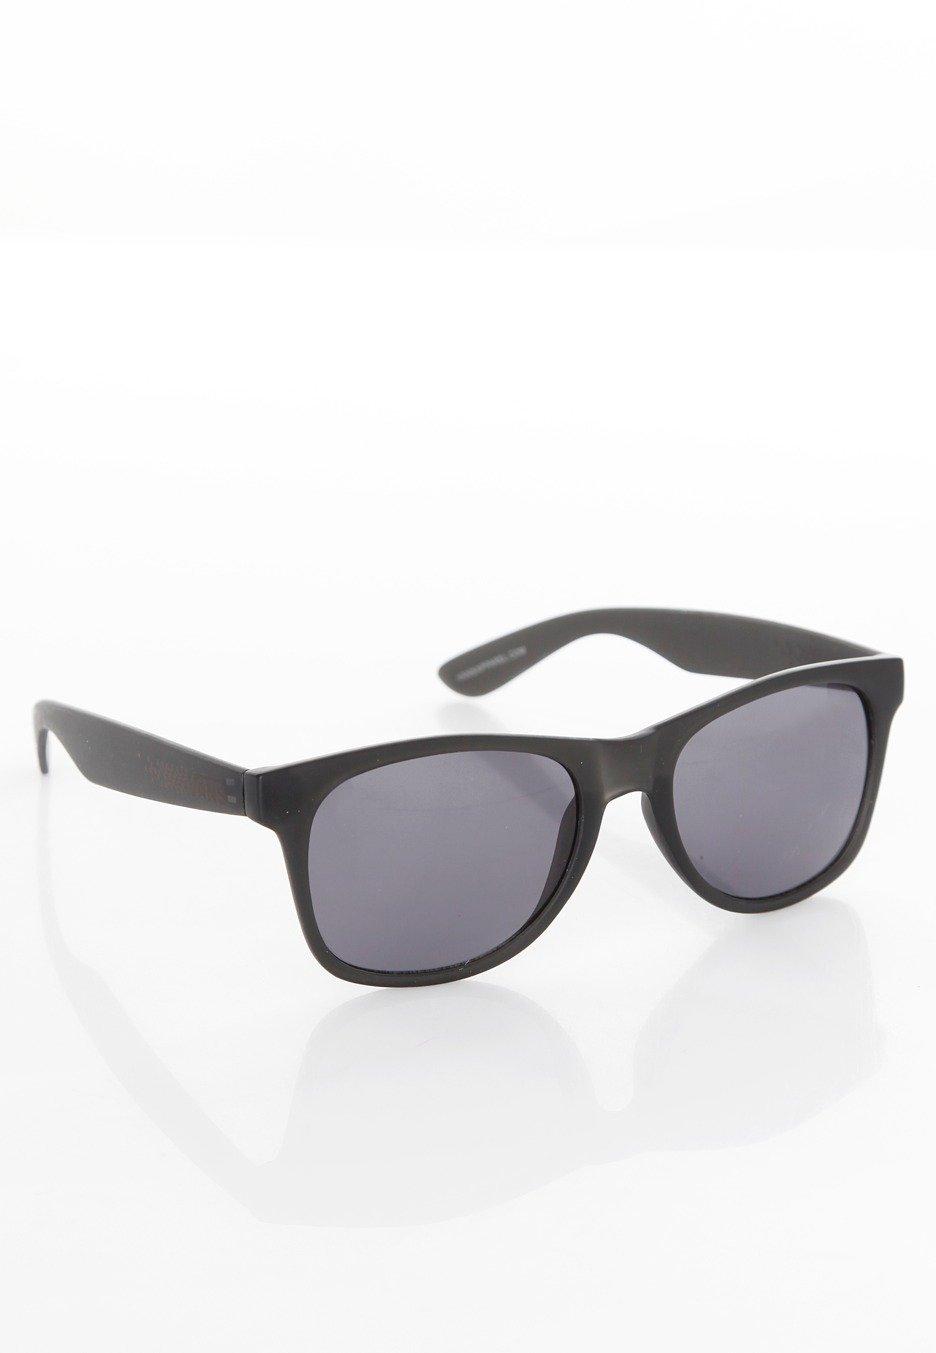 Vans Spicoli 4 Shades Black Frosted Translucent Sonnenbrille